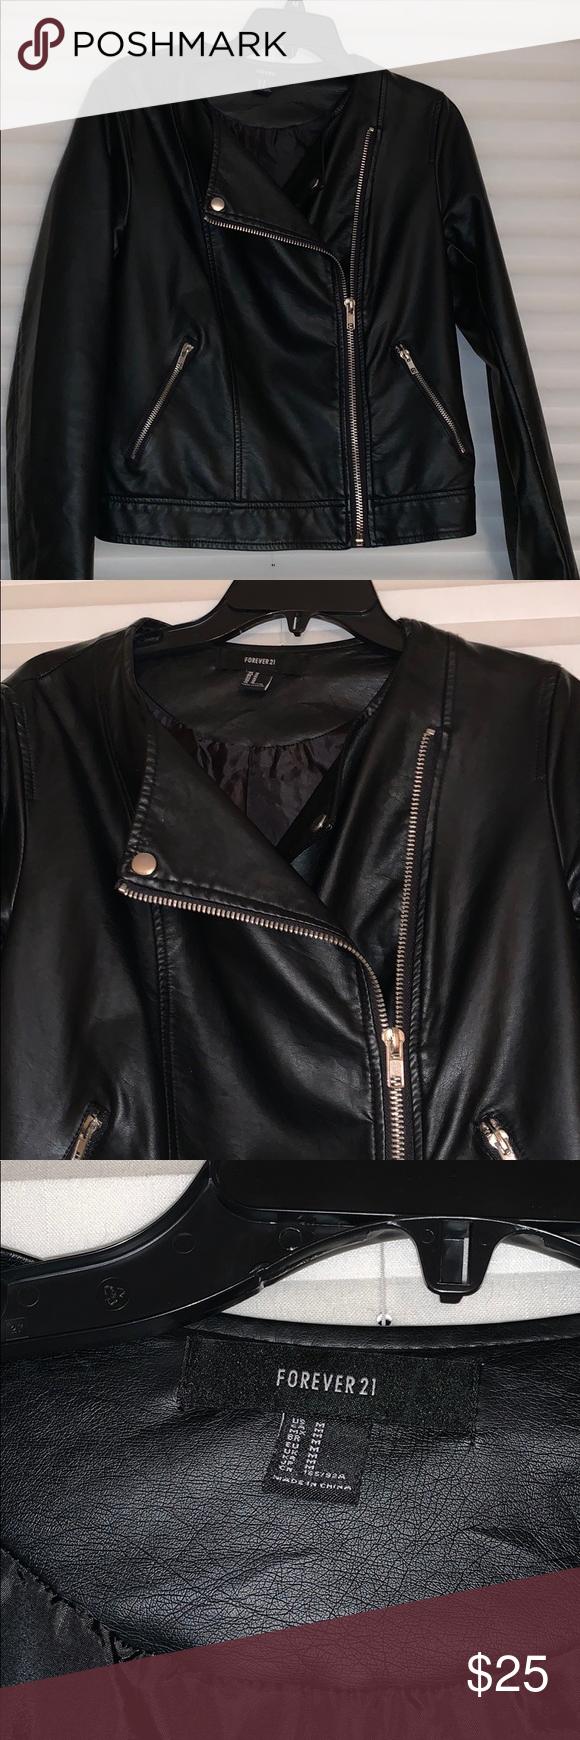 2 20 Black Faux Leather Jacket Black Faux Leather Jacket Leather Jacket Faux Leather Jackets [ 1740 x 580 Pixel ]